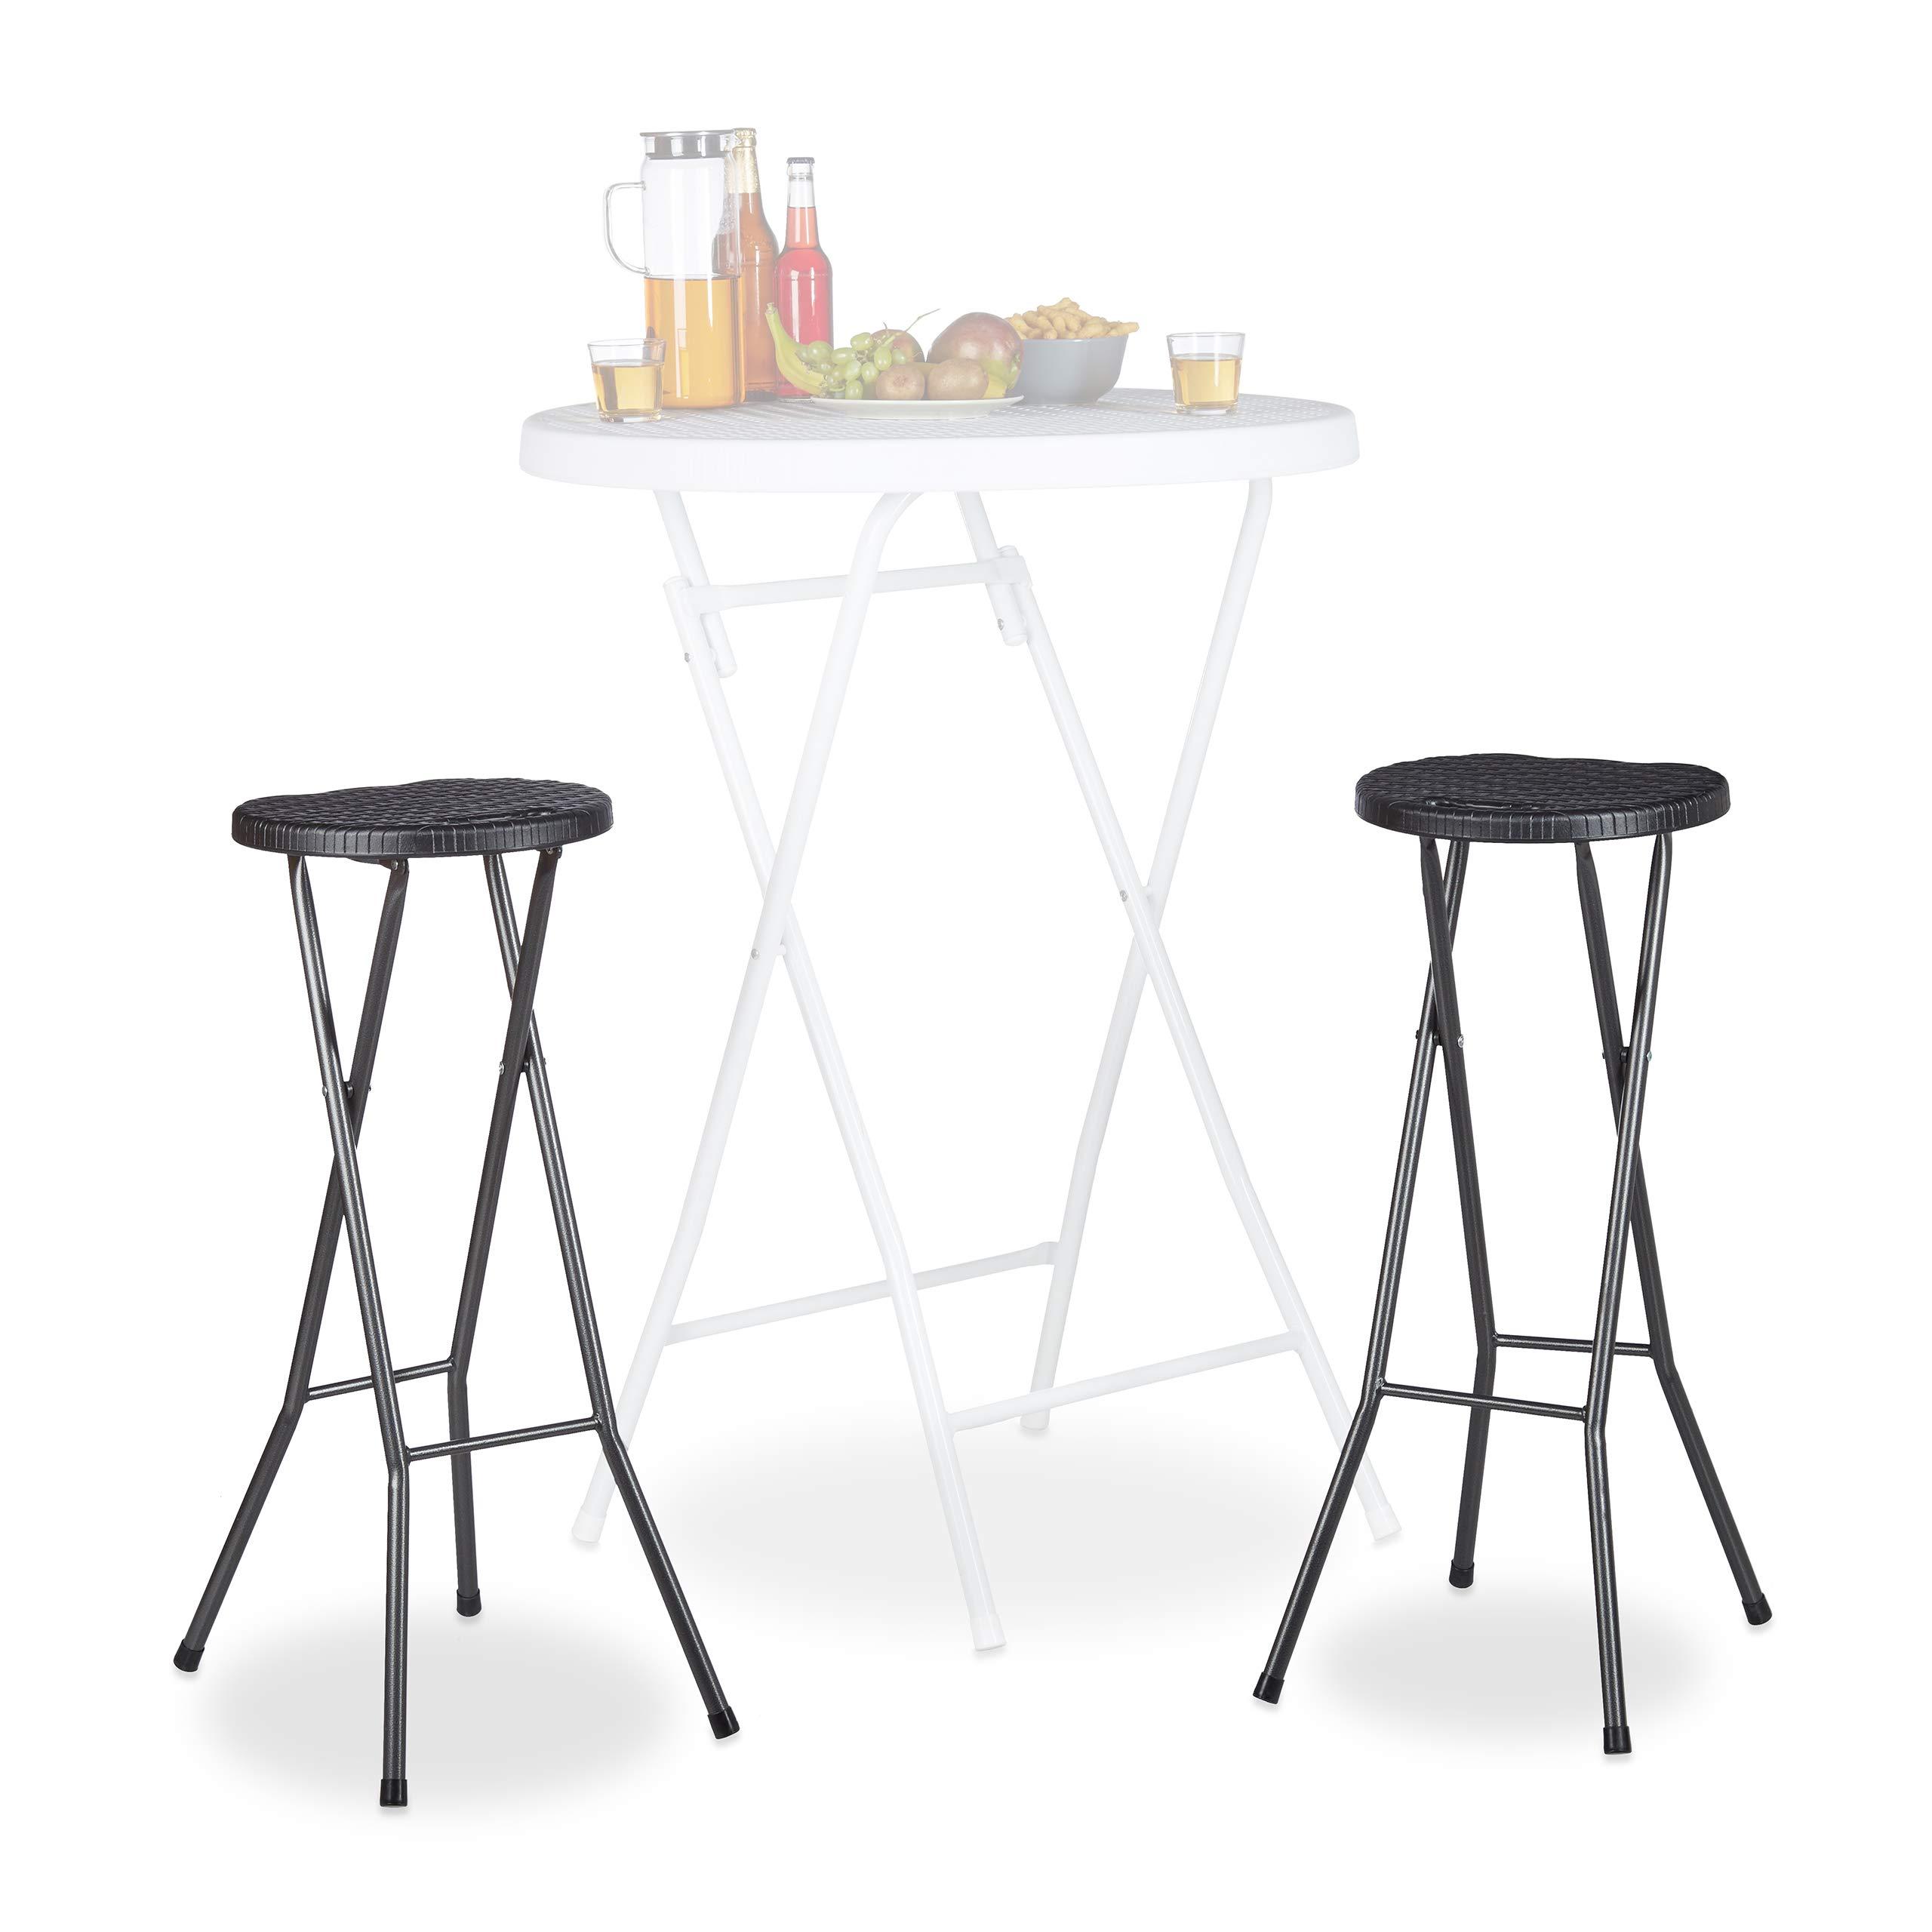 Relaxdays Bastian - Taburetes de bar plegables, Impermeable, Plástico, 80 cm de Altura, 2 unidades: Amazon.es: Hogar